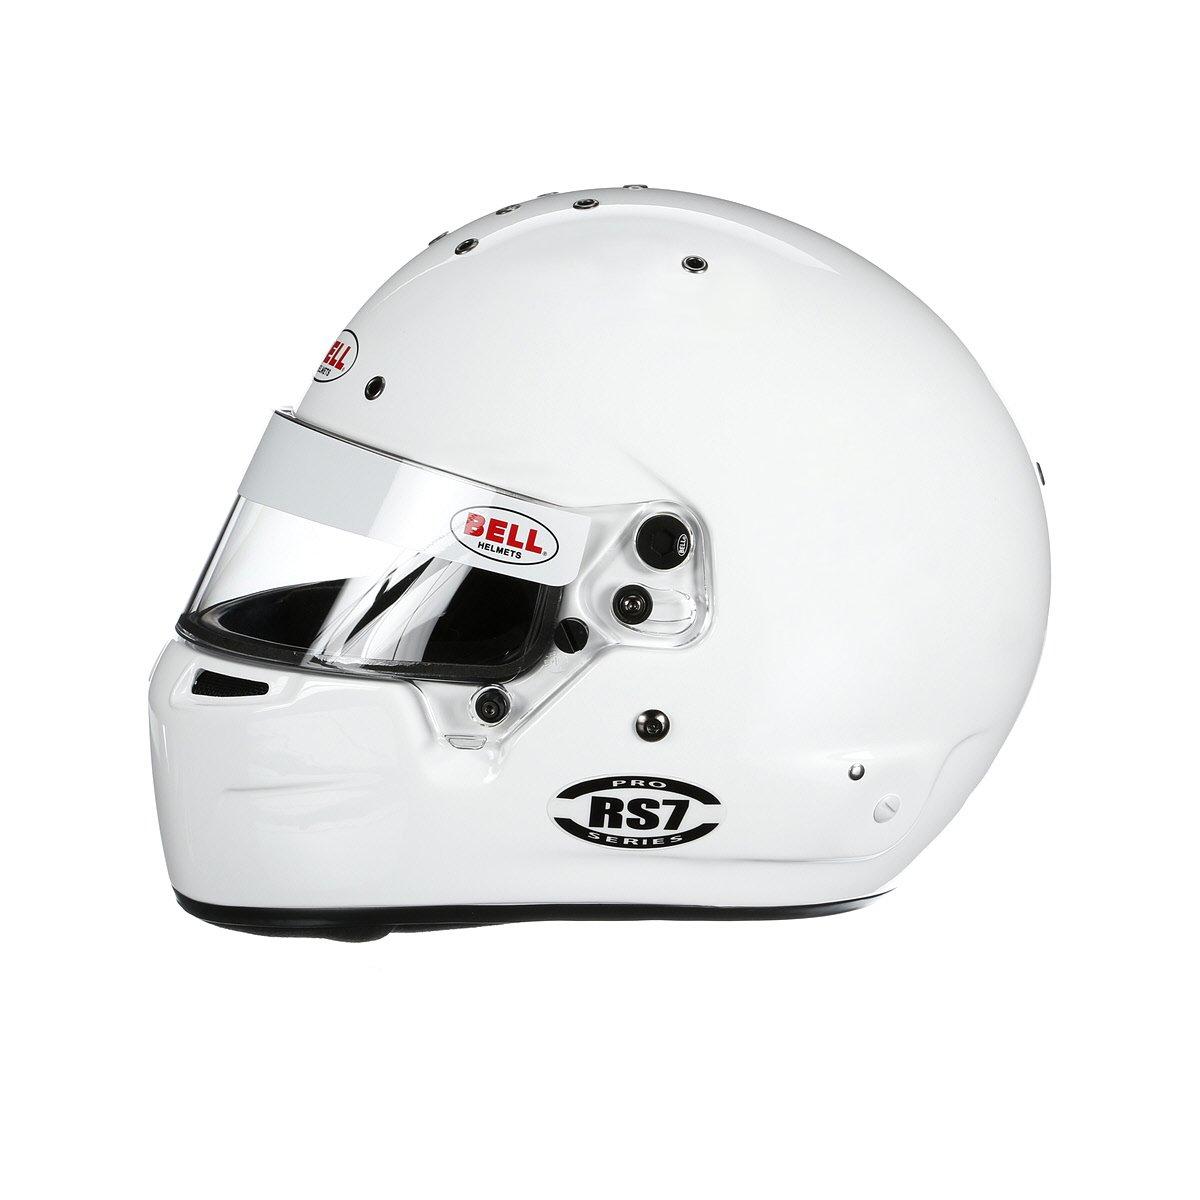 Bell Racing Helmets >> Amazon Com Bell Racing Rs7 Helmet White 57 7 1 8 Automotive